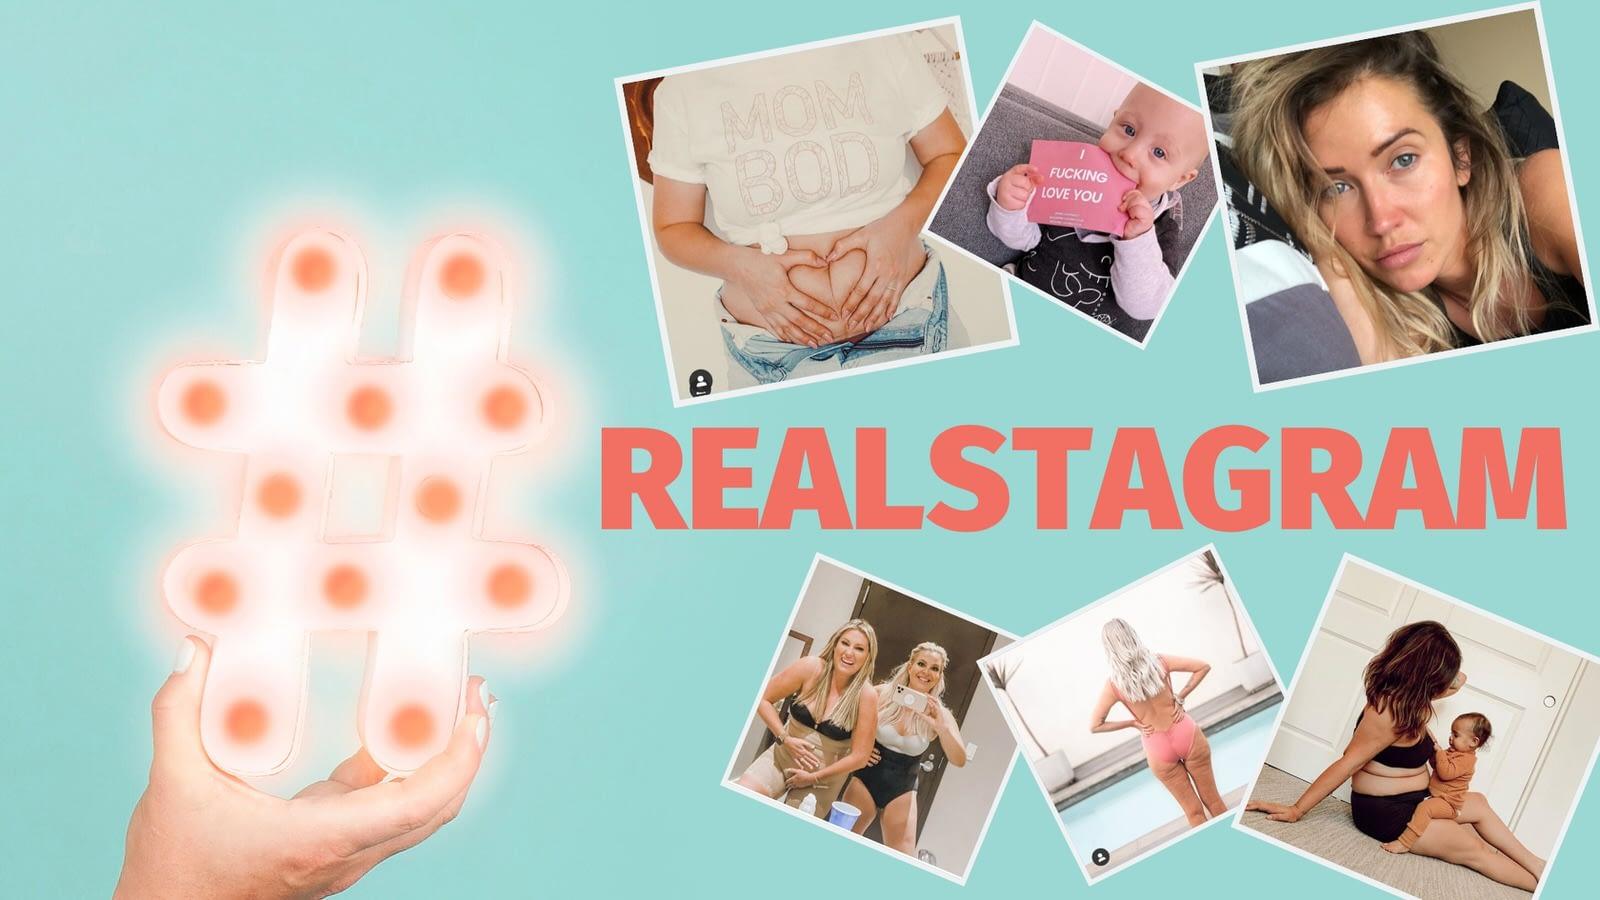 Realstagram